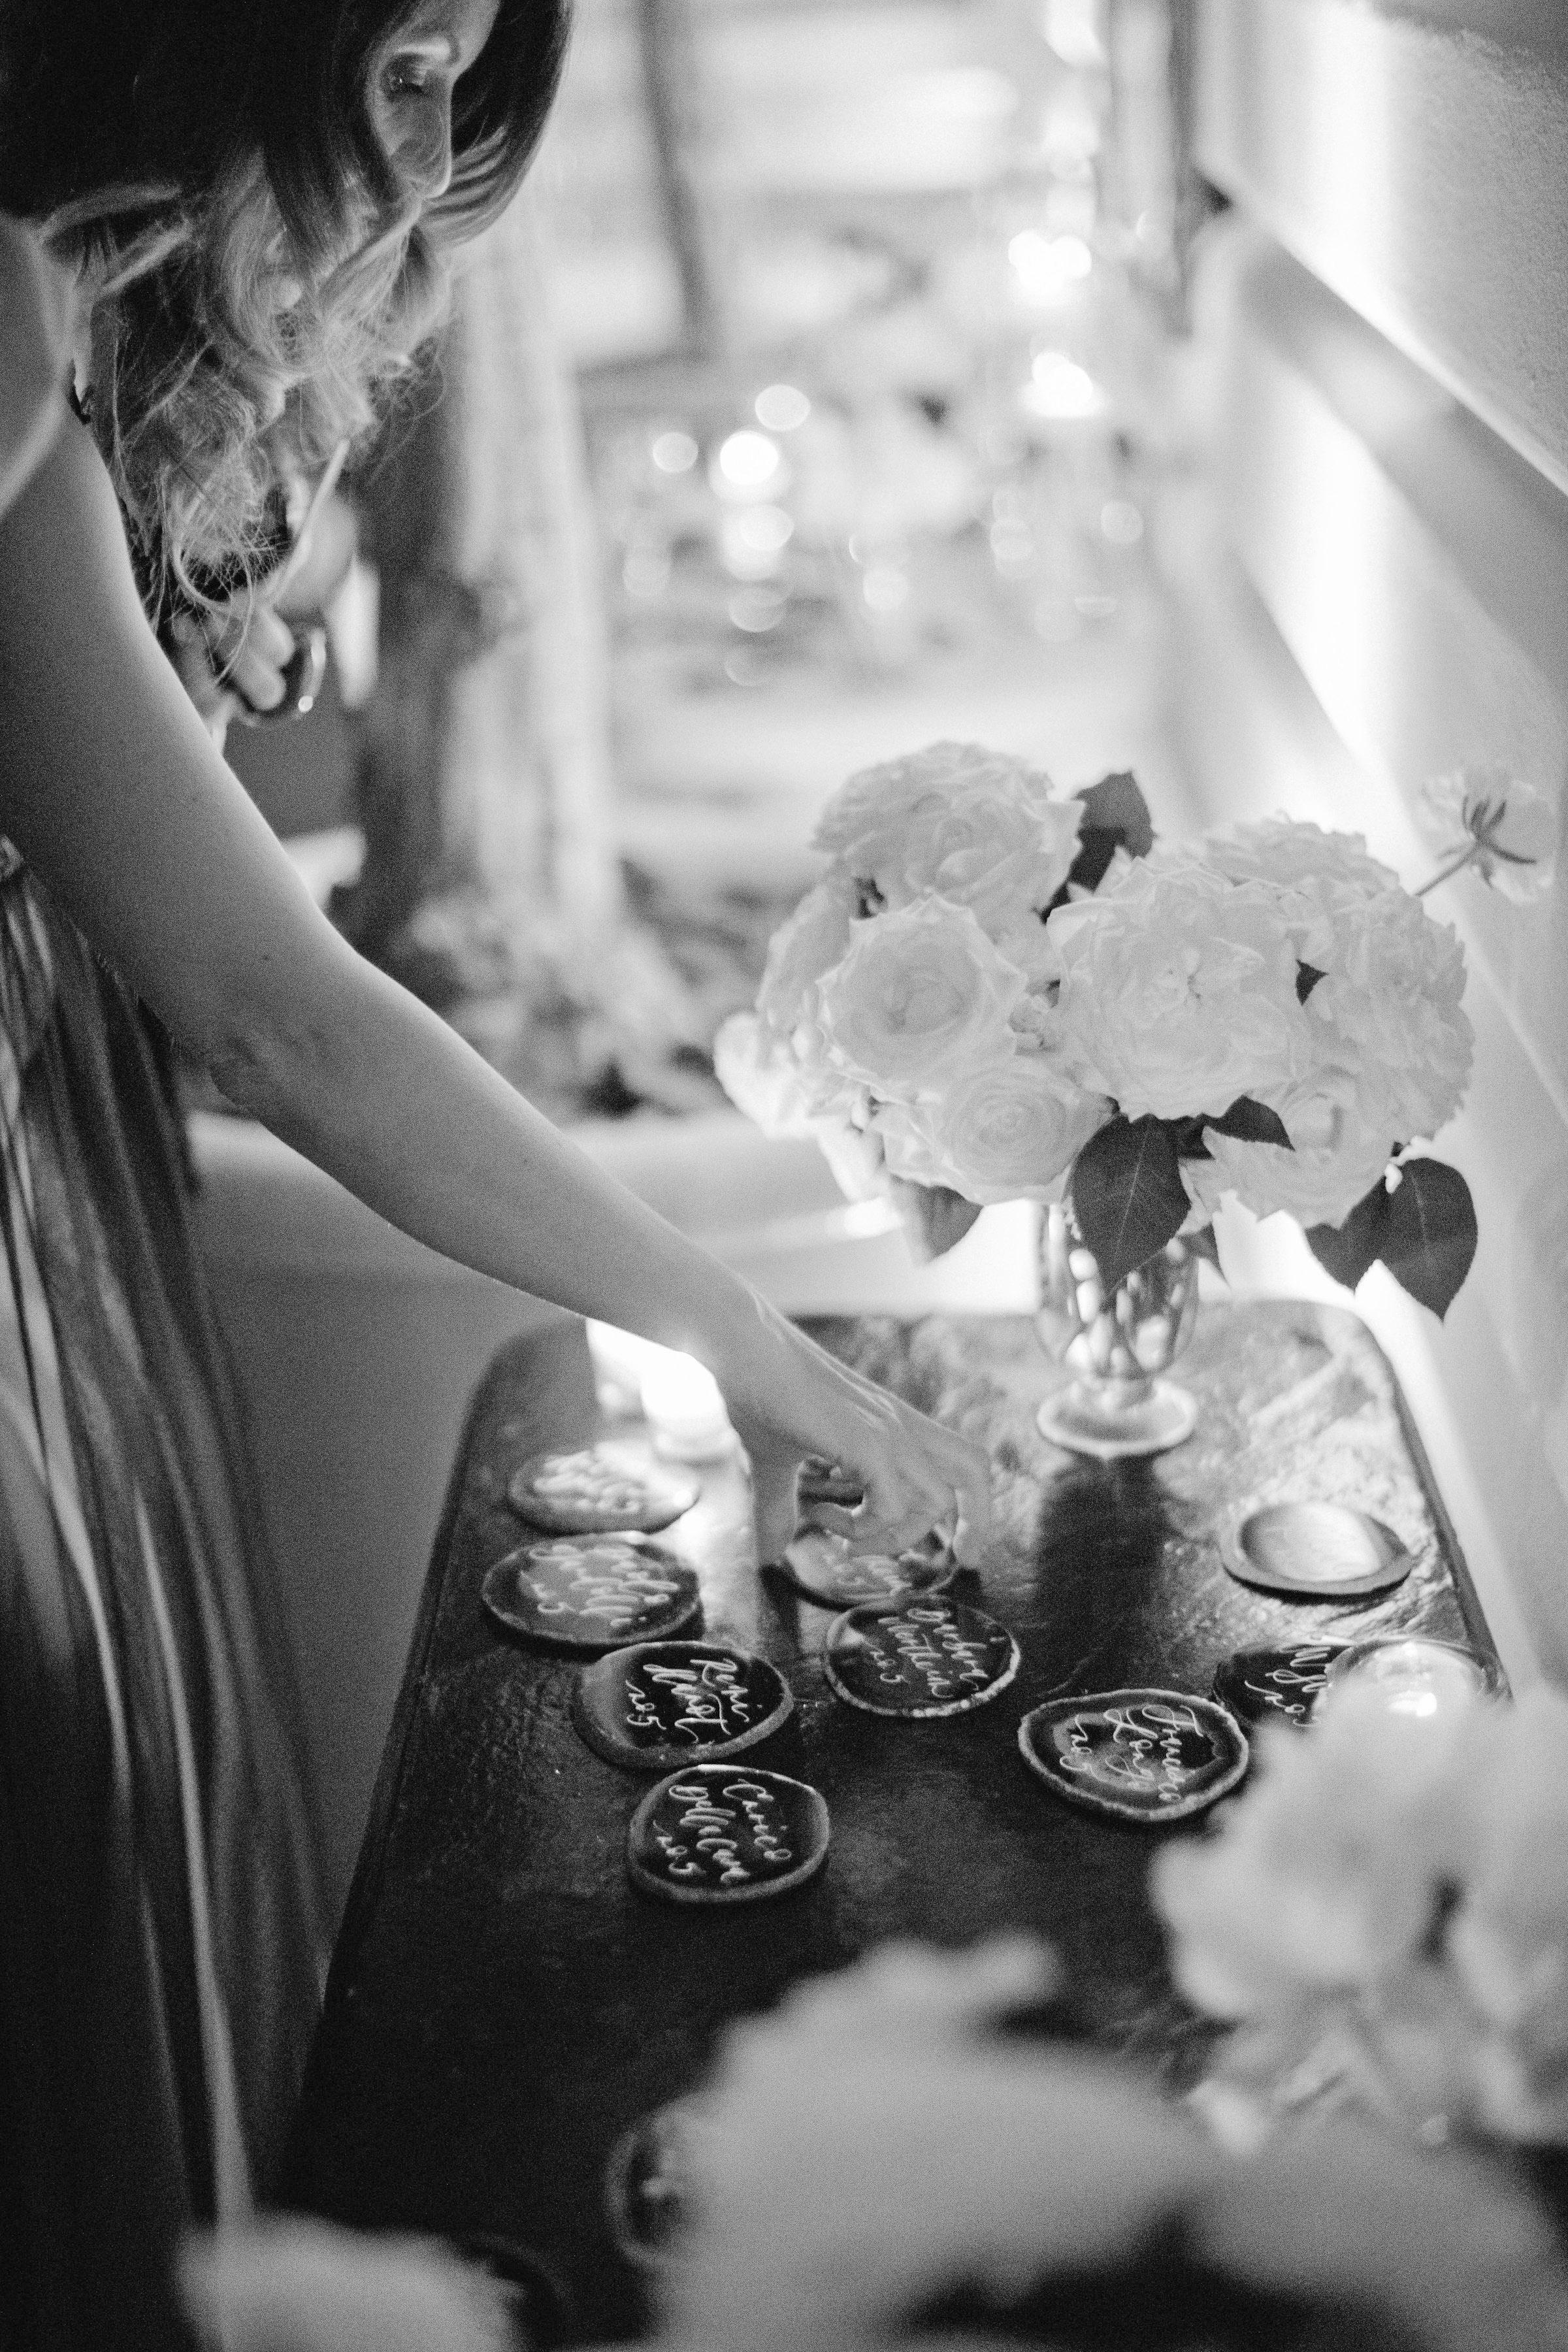 jiannina enzo wedding escortcards